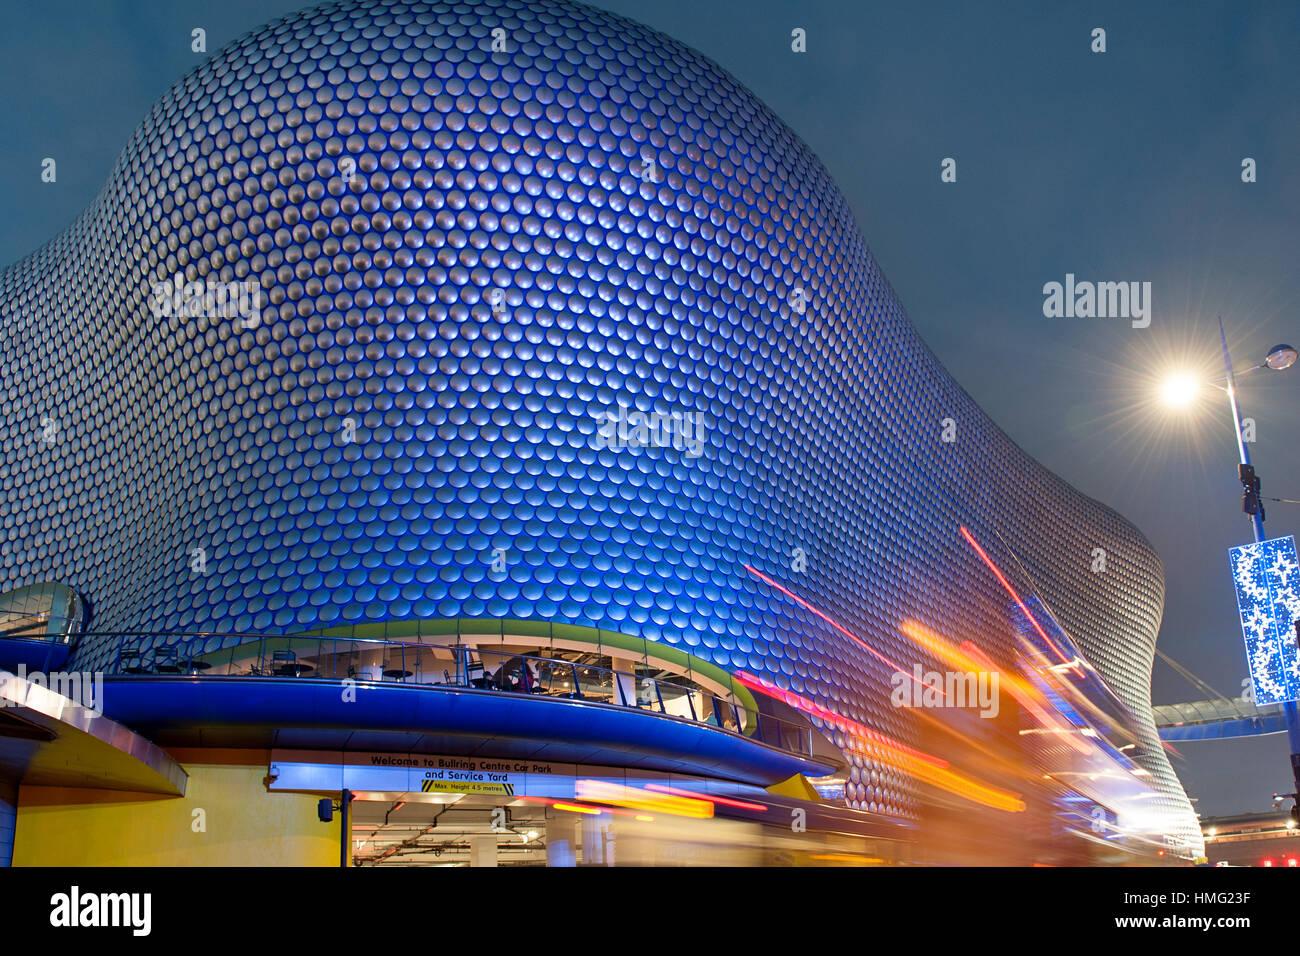 Car light trails at Selfridges Department Store at the Bullring Birmingham, West Midlands, England, United Kingdom Stock Photo